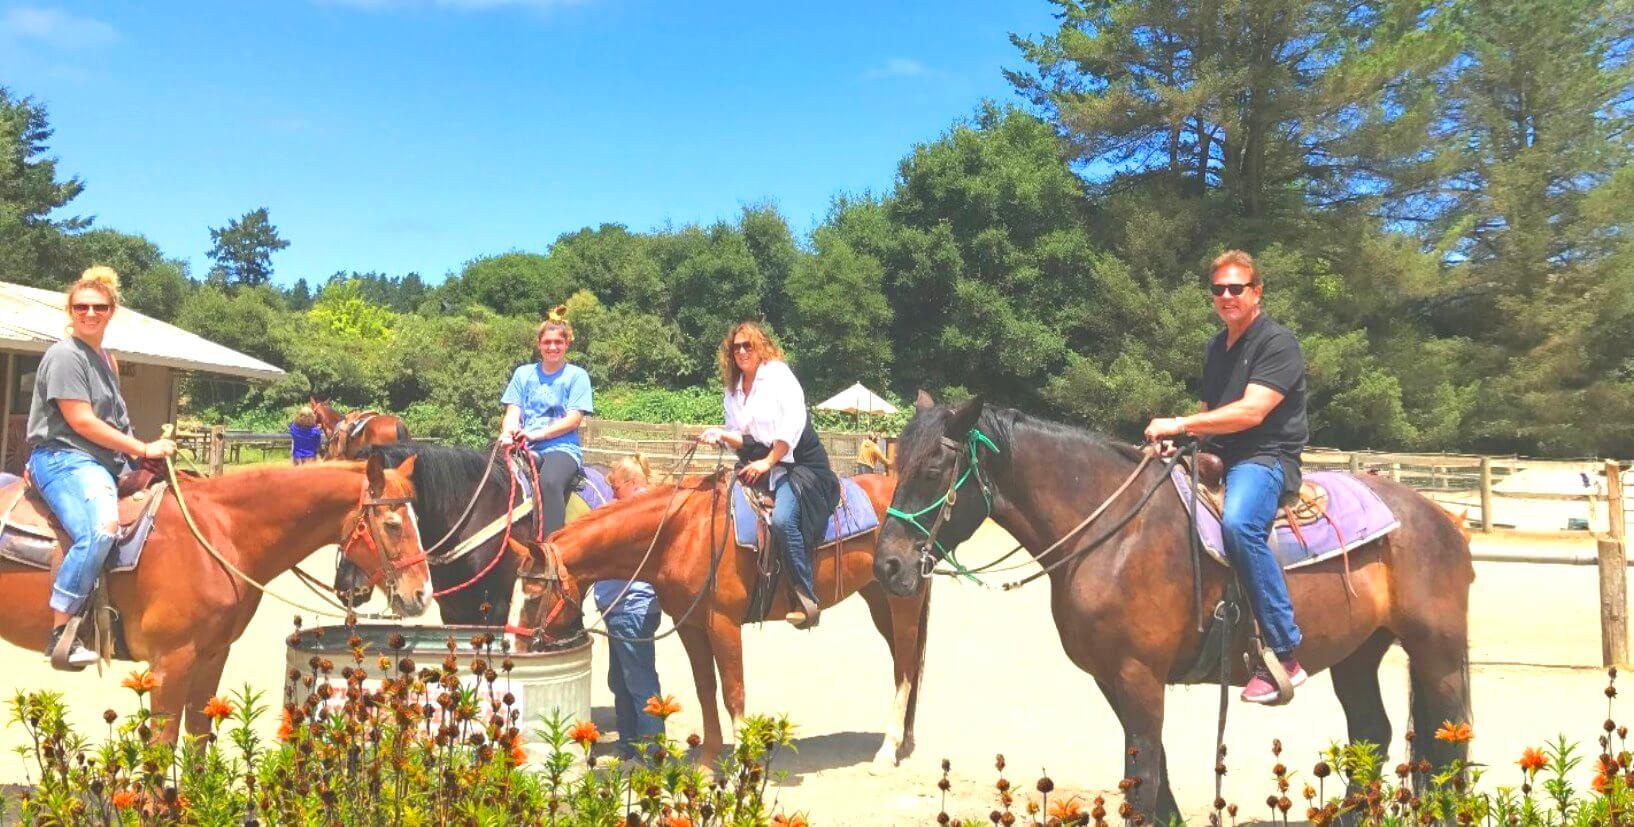 Horseback-Rides-on-the-Beach-SanFrancisco-Occean-beach-muirwoodsf